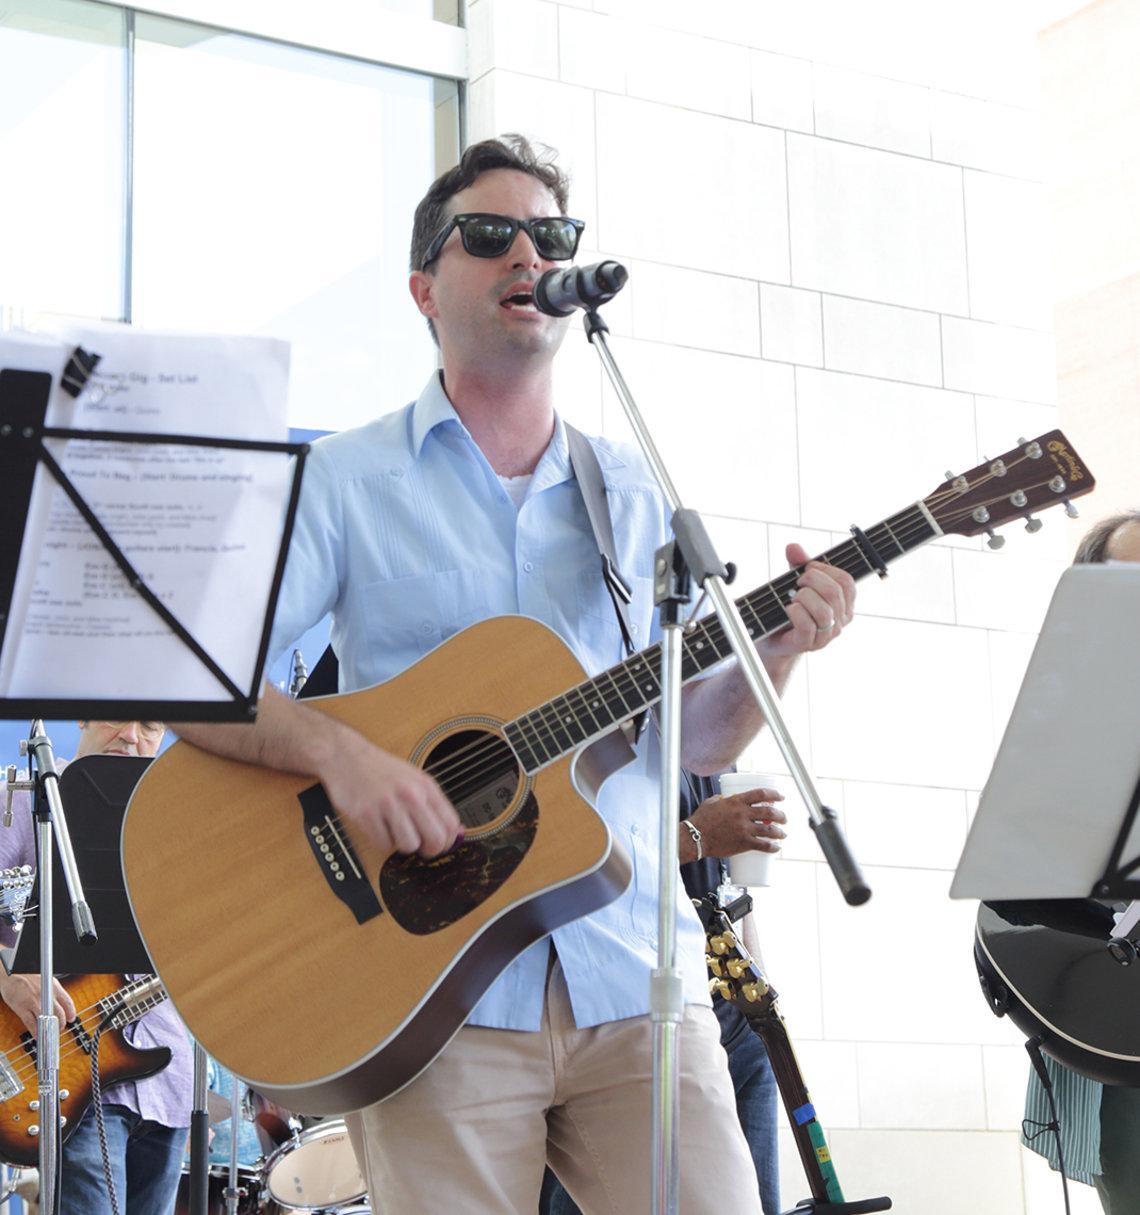 Guitarist Grayson sings.